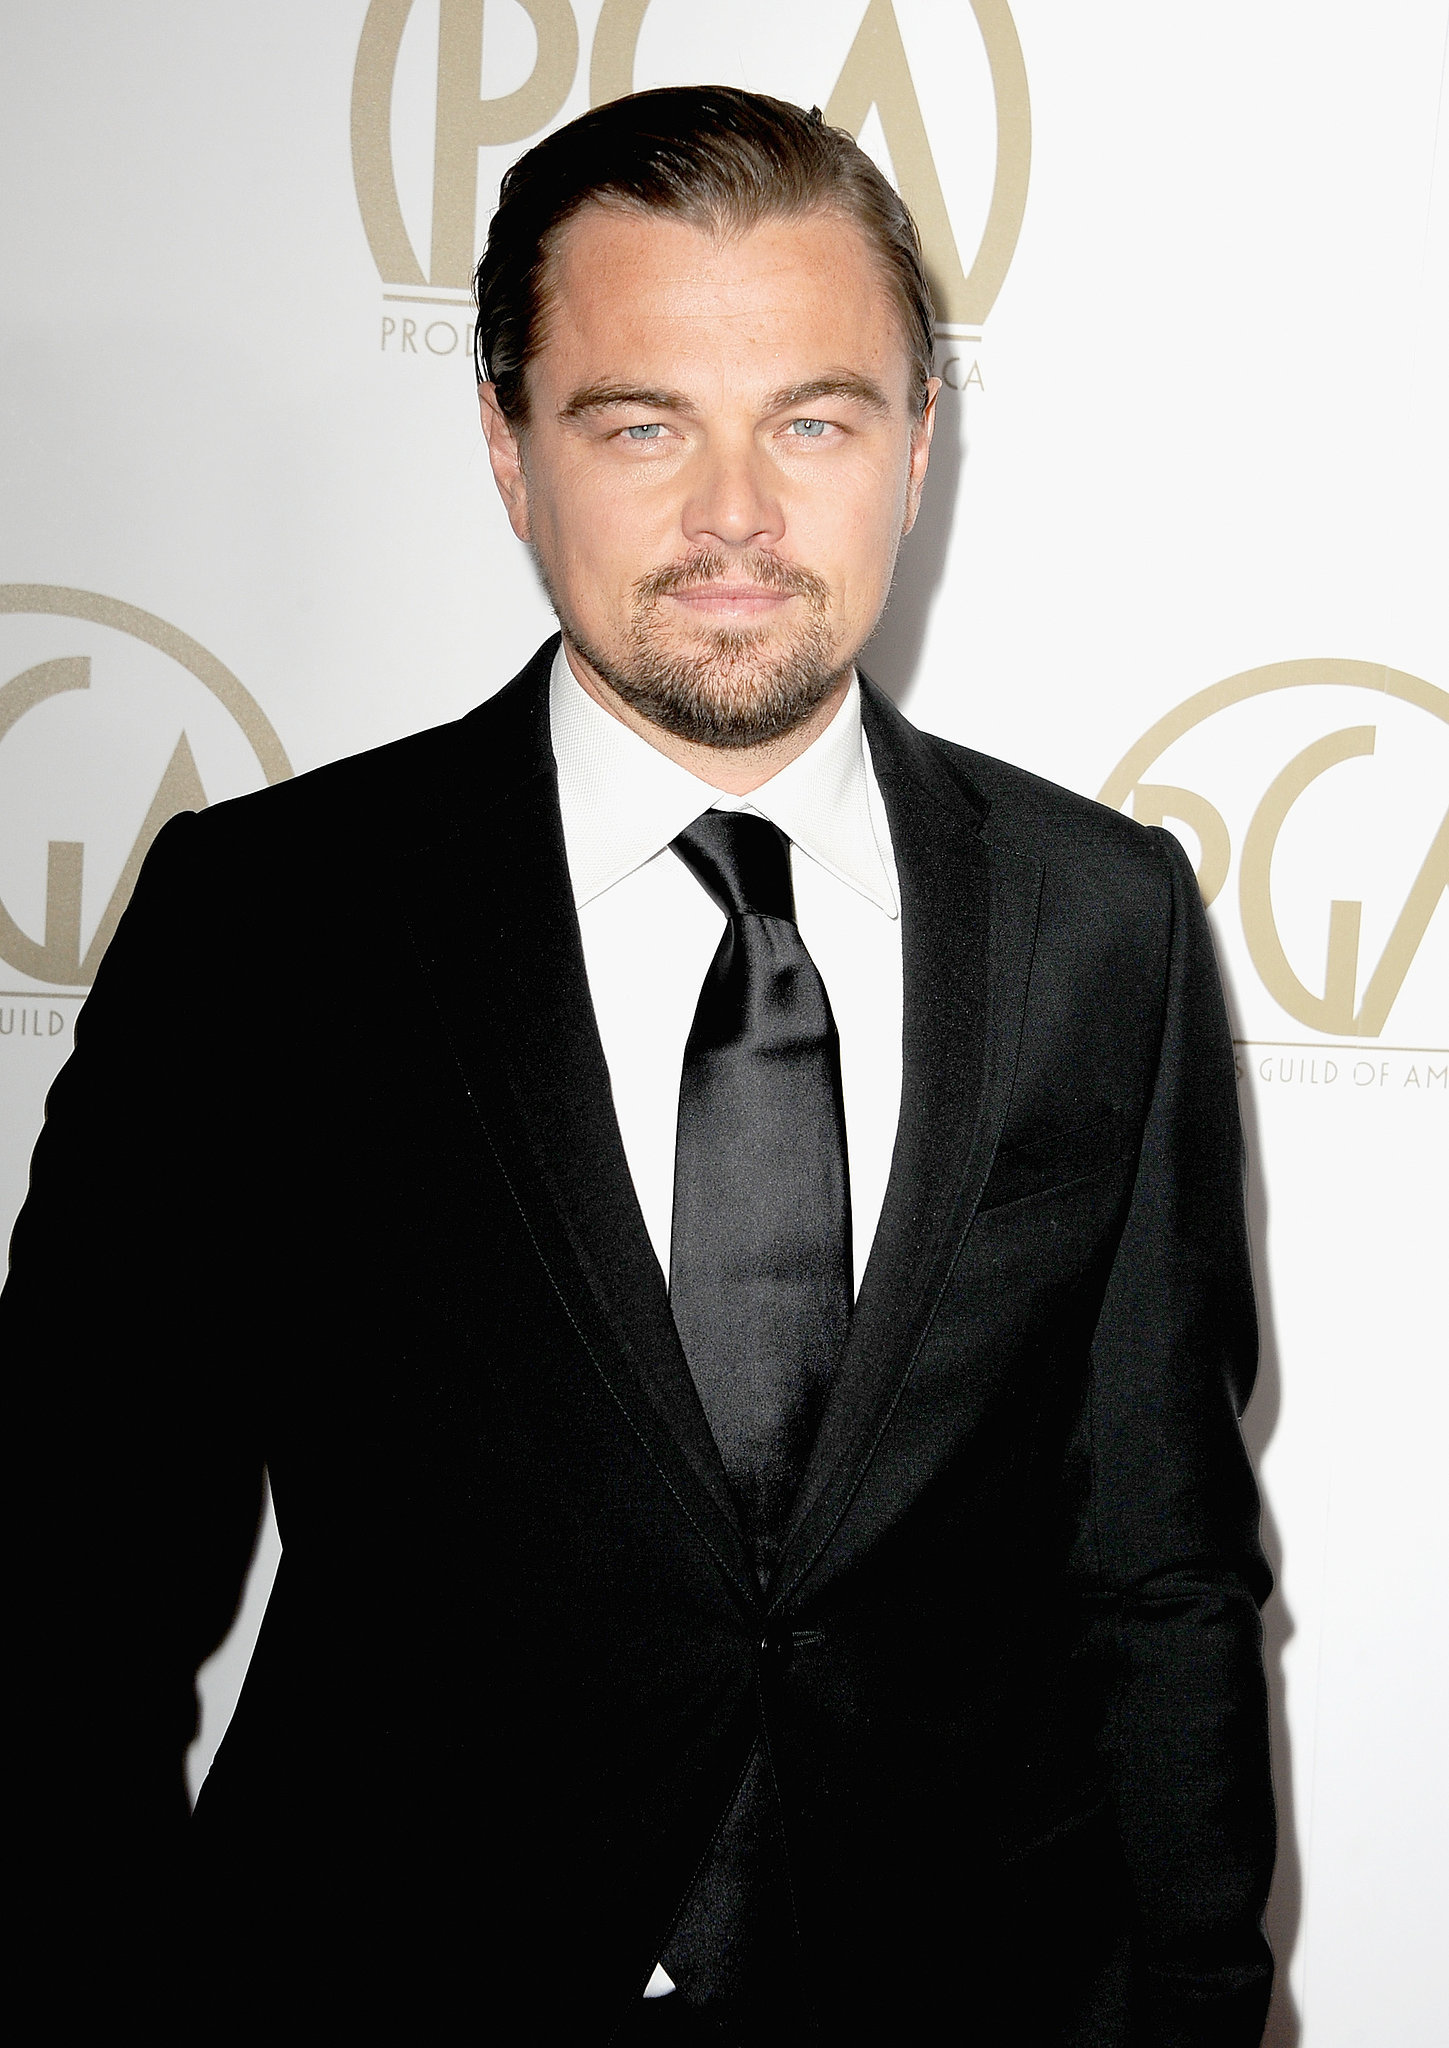 Leonardo DiCaprio kept it simple in a black suit.